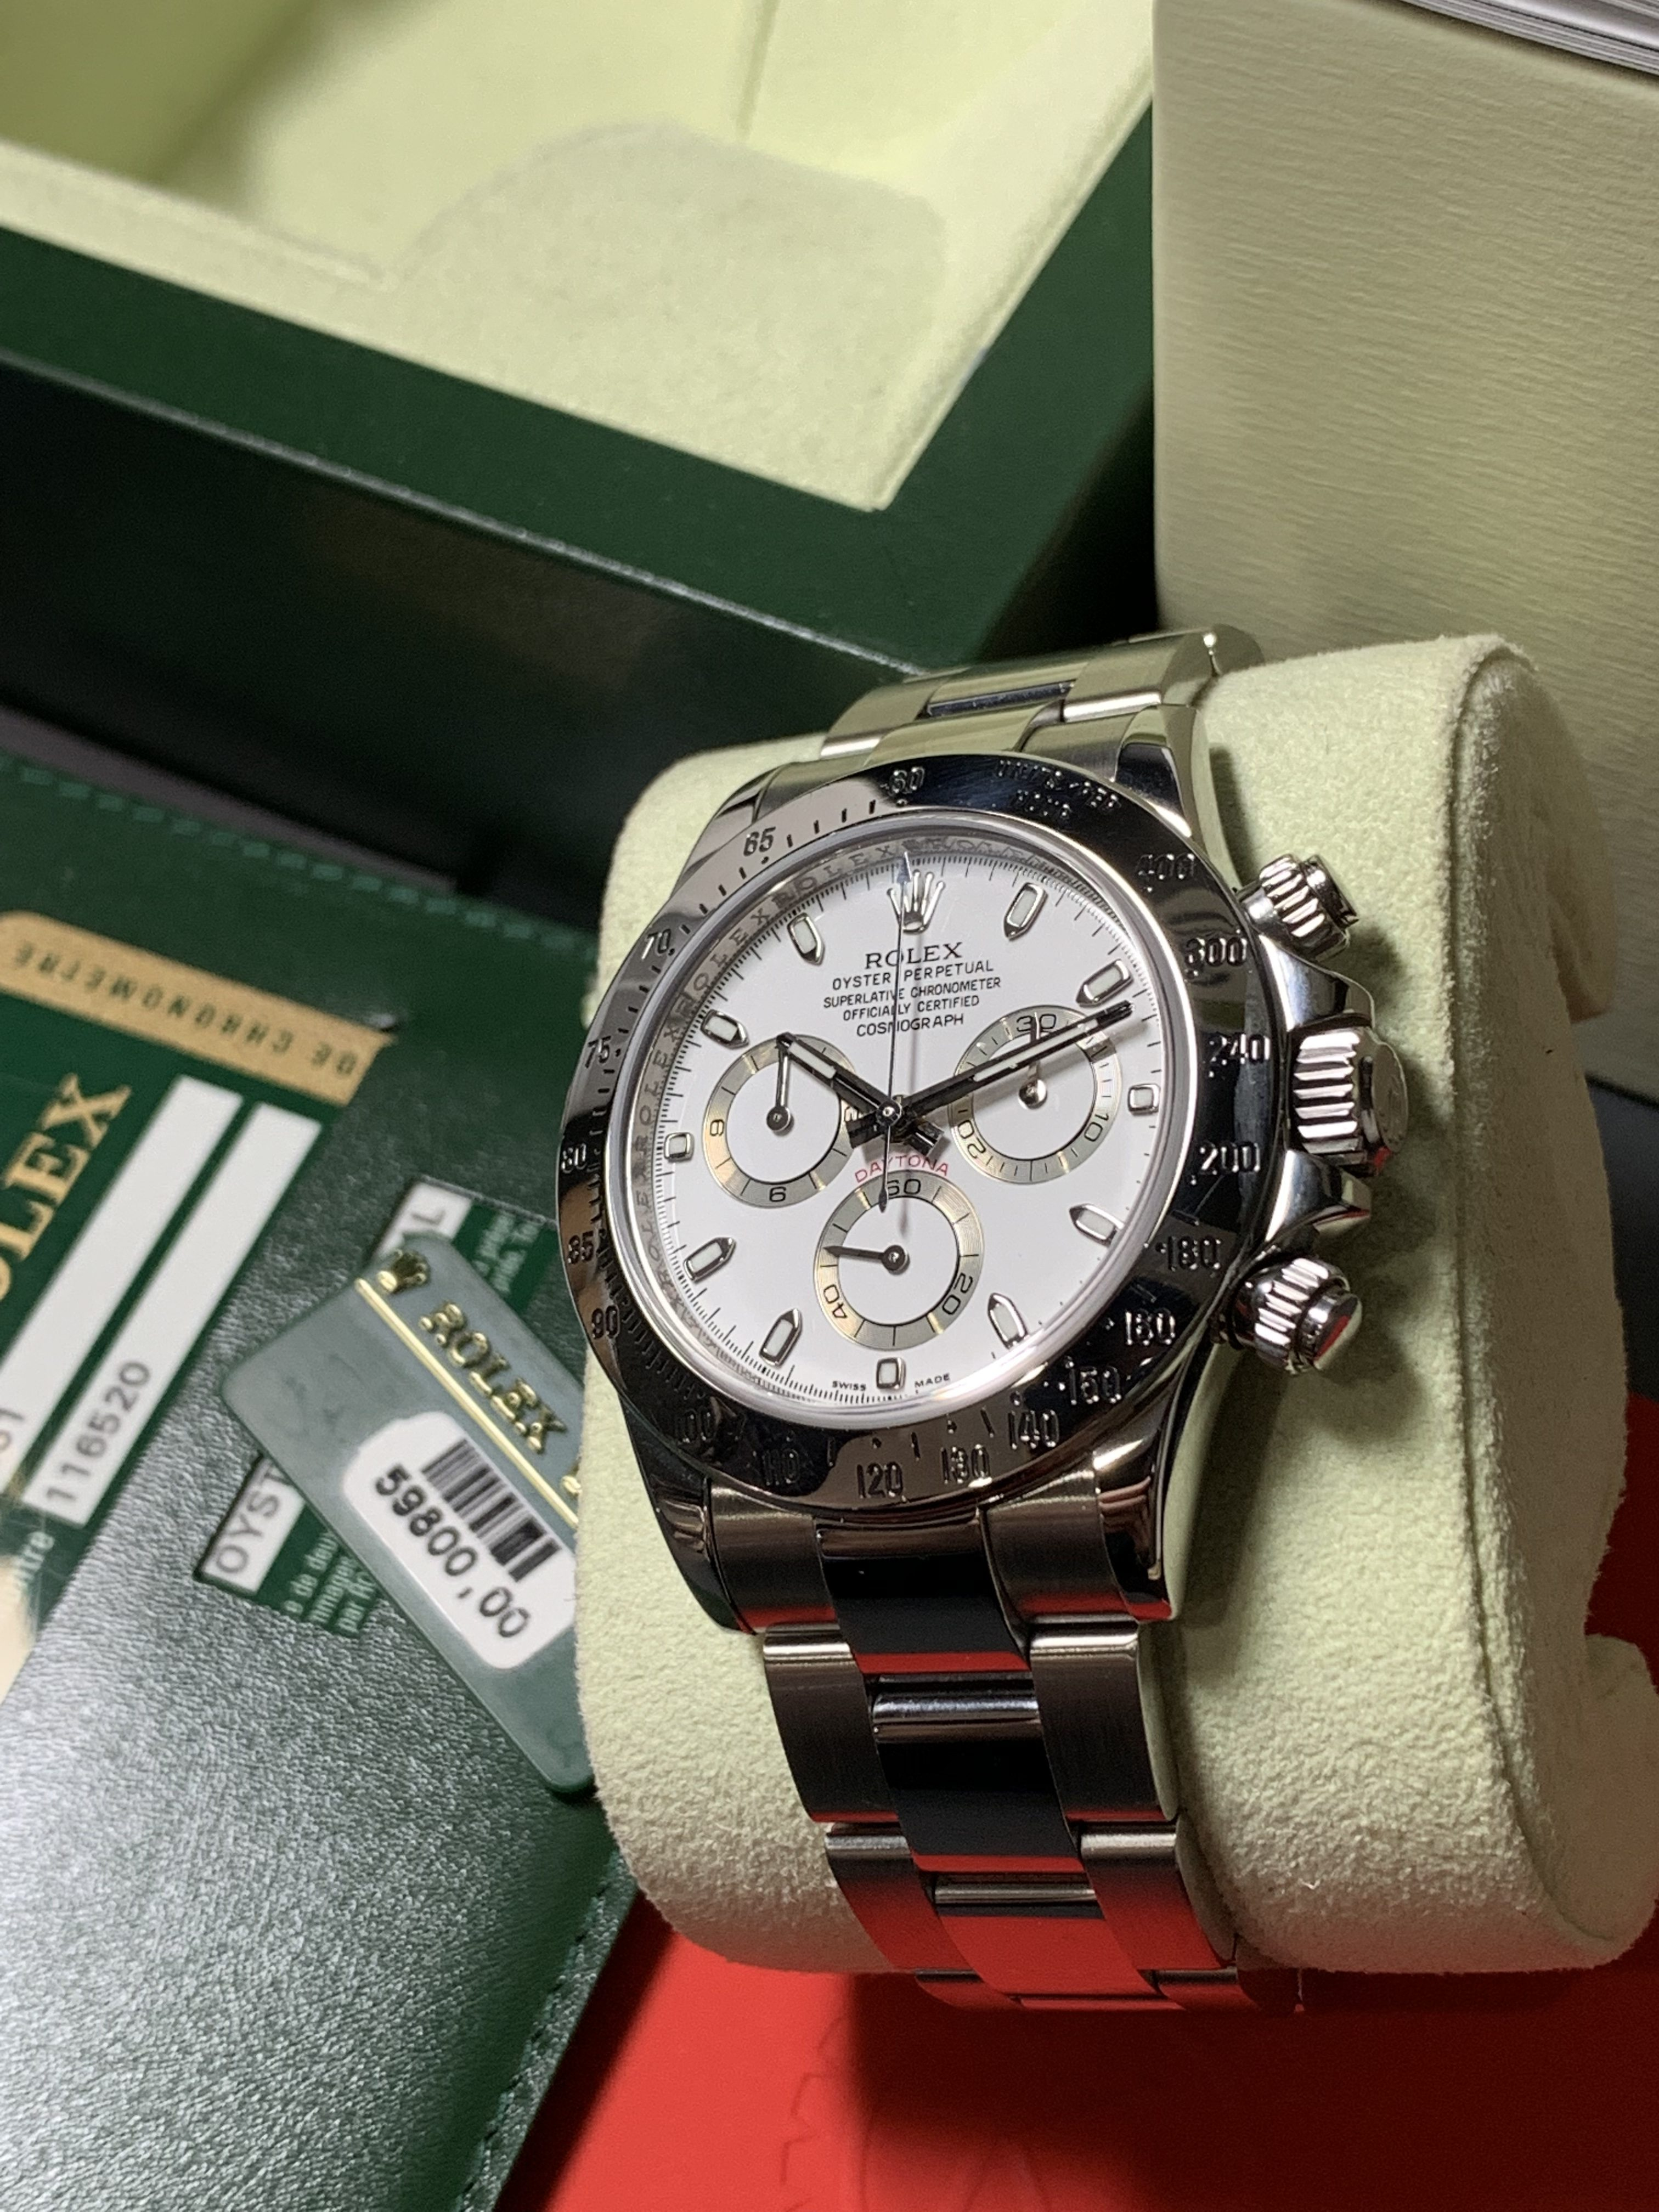 Daytona Rolex Watch >> ROLEX DAYTONA 116520 WHITE DIAL STAINLESS STEEL - Carr Watches